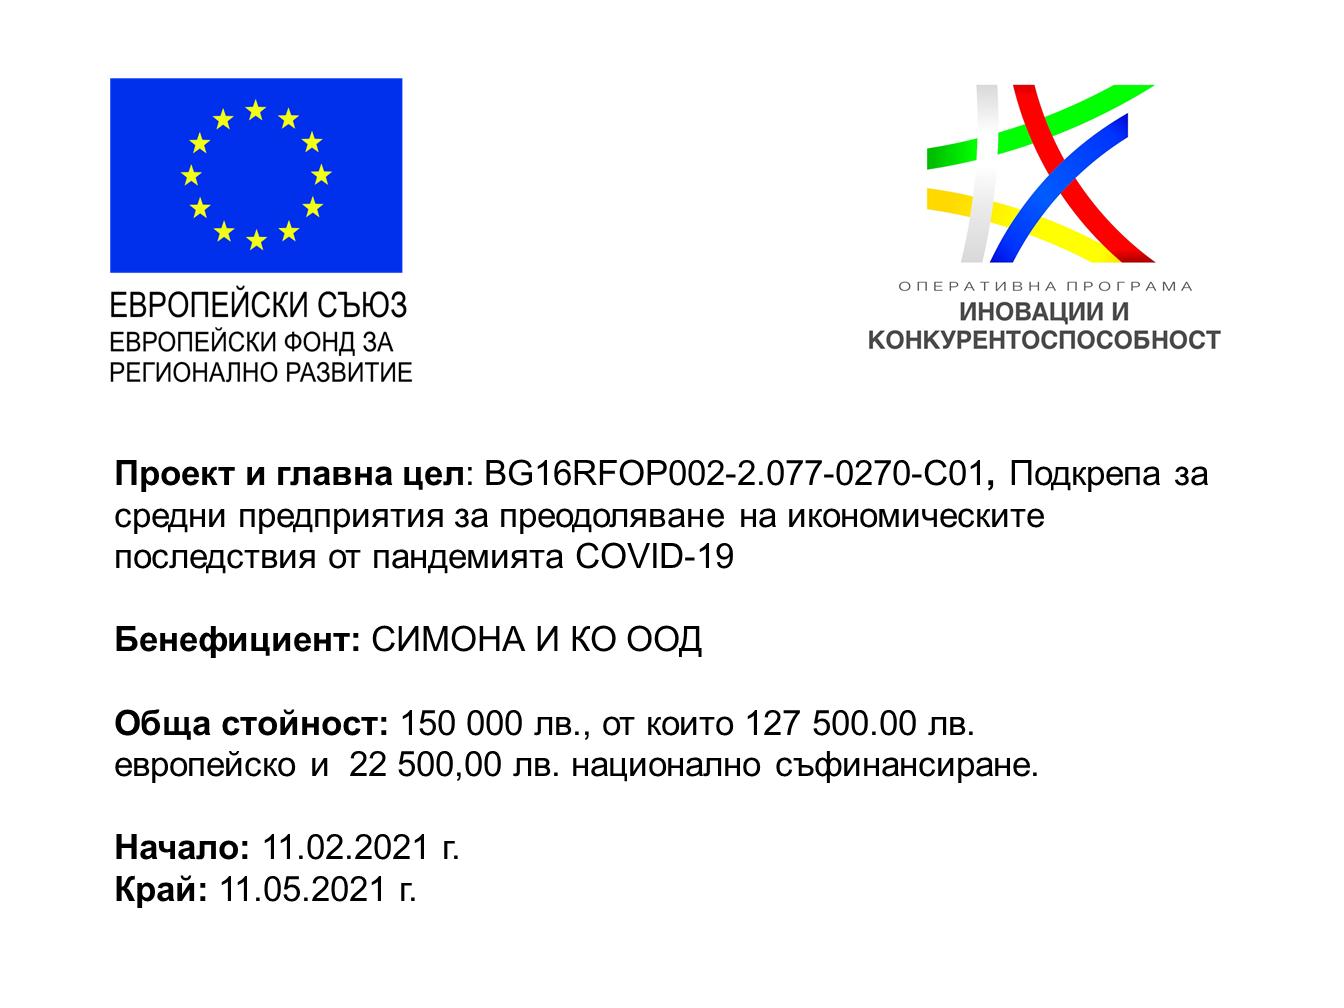 Спечелен проект по Европейска програма